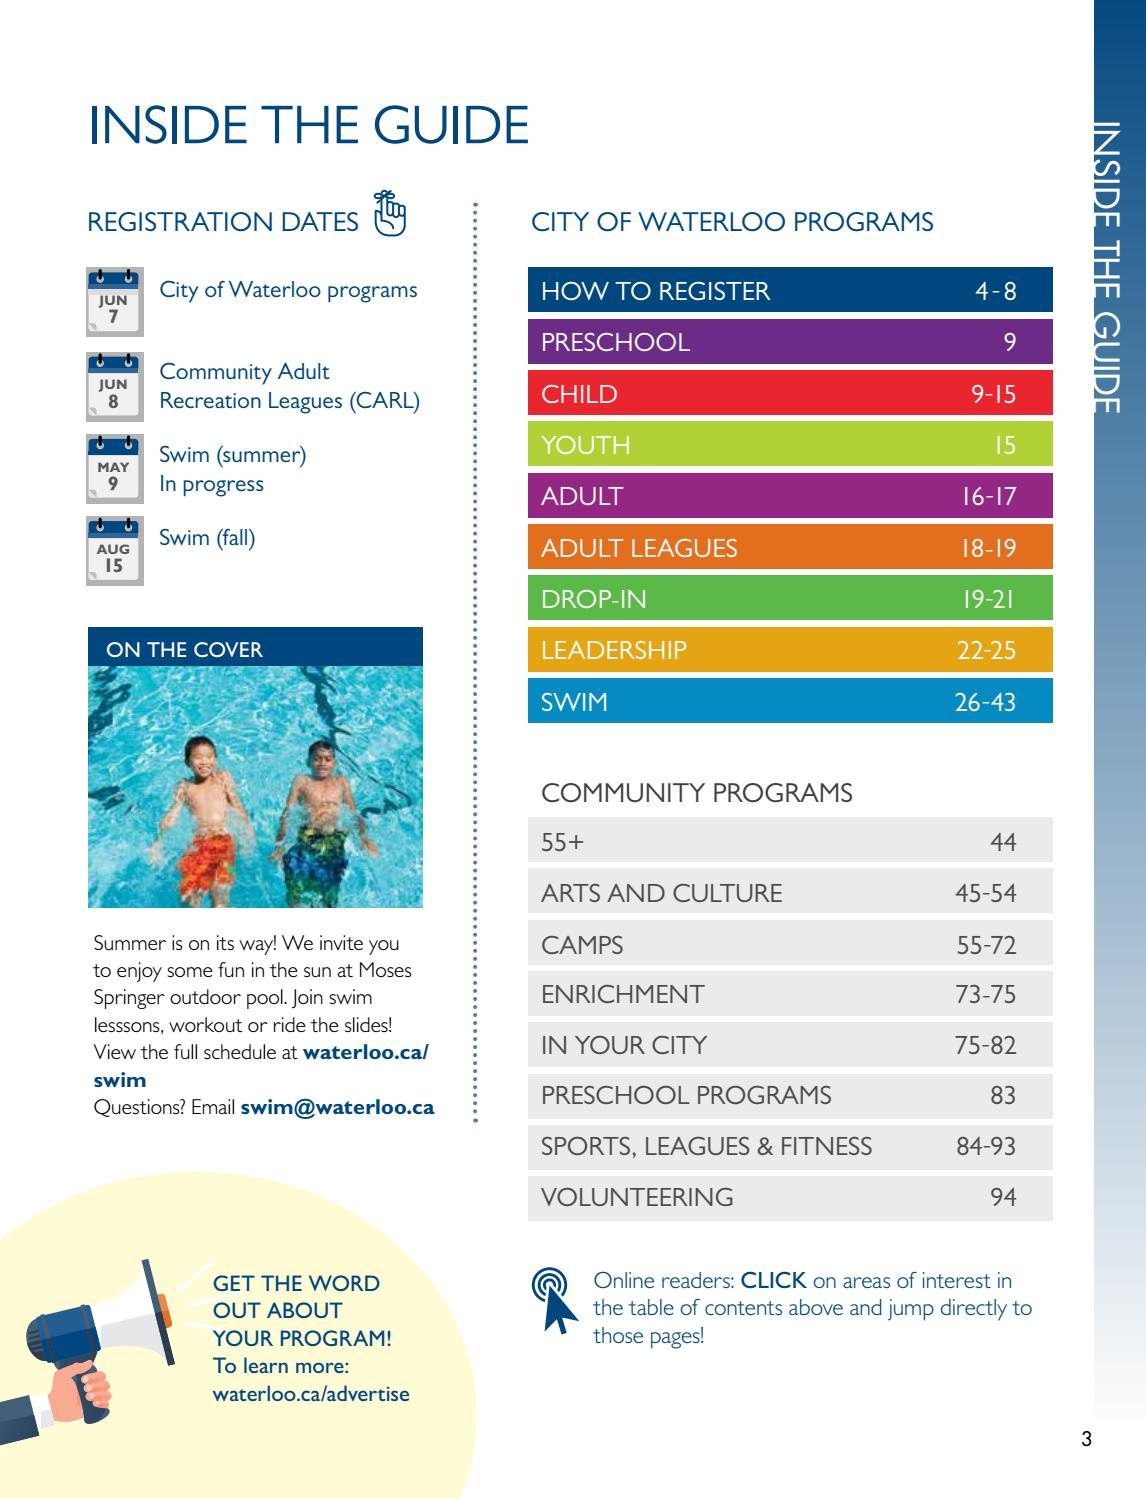 Summer 2017 Program Activities Guide By City Of Waterloo Issuu